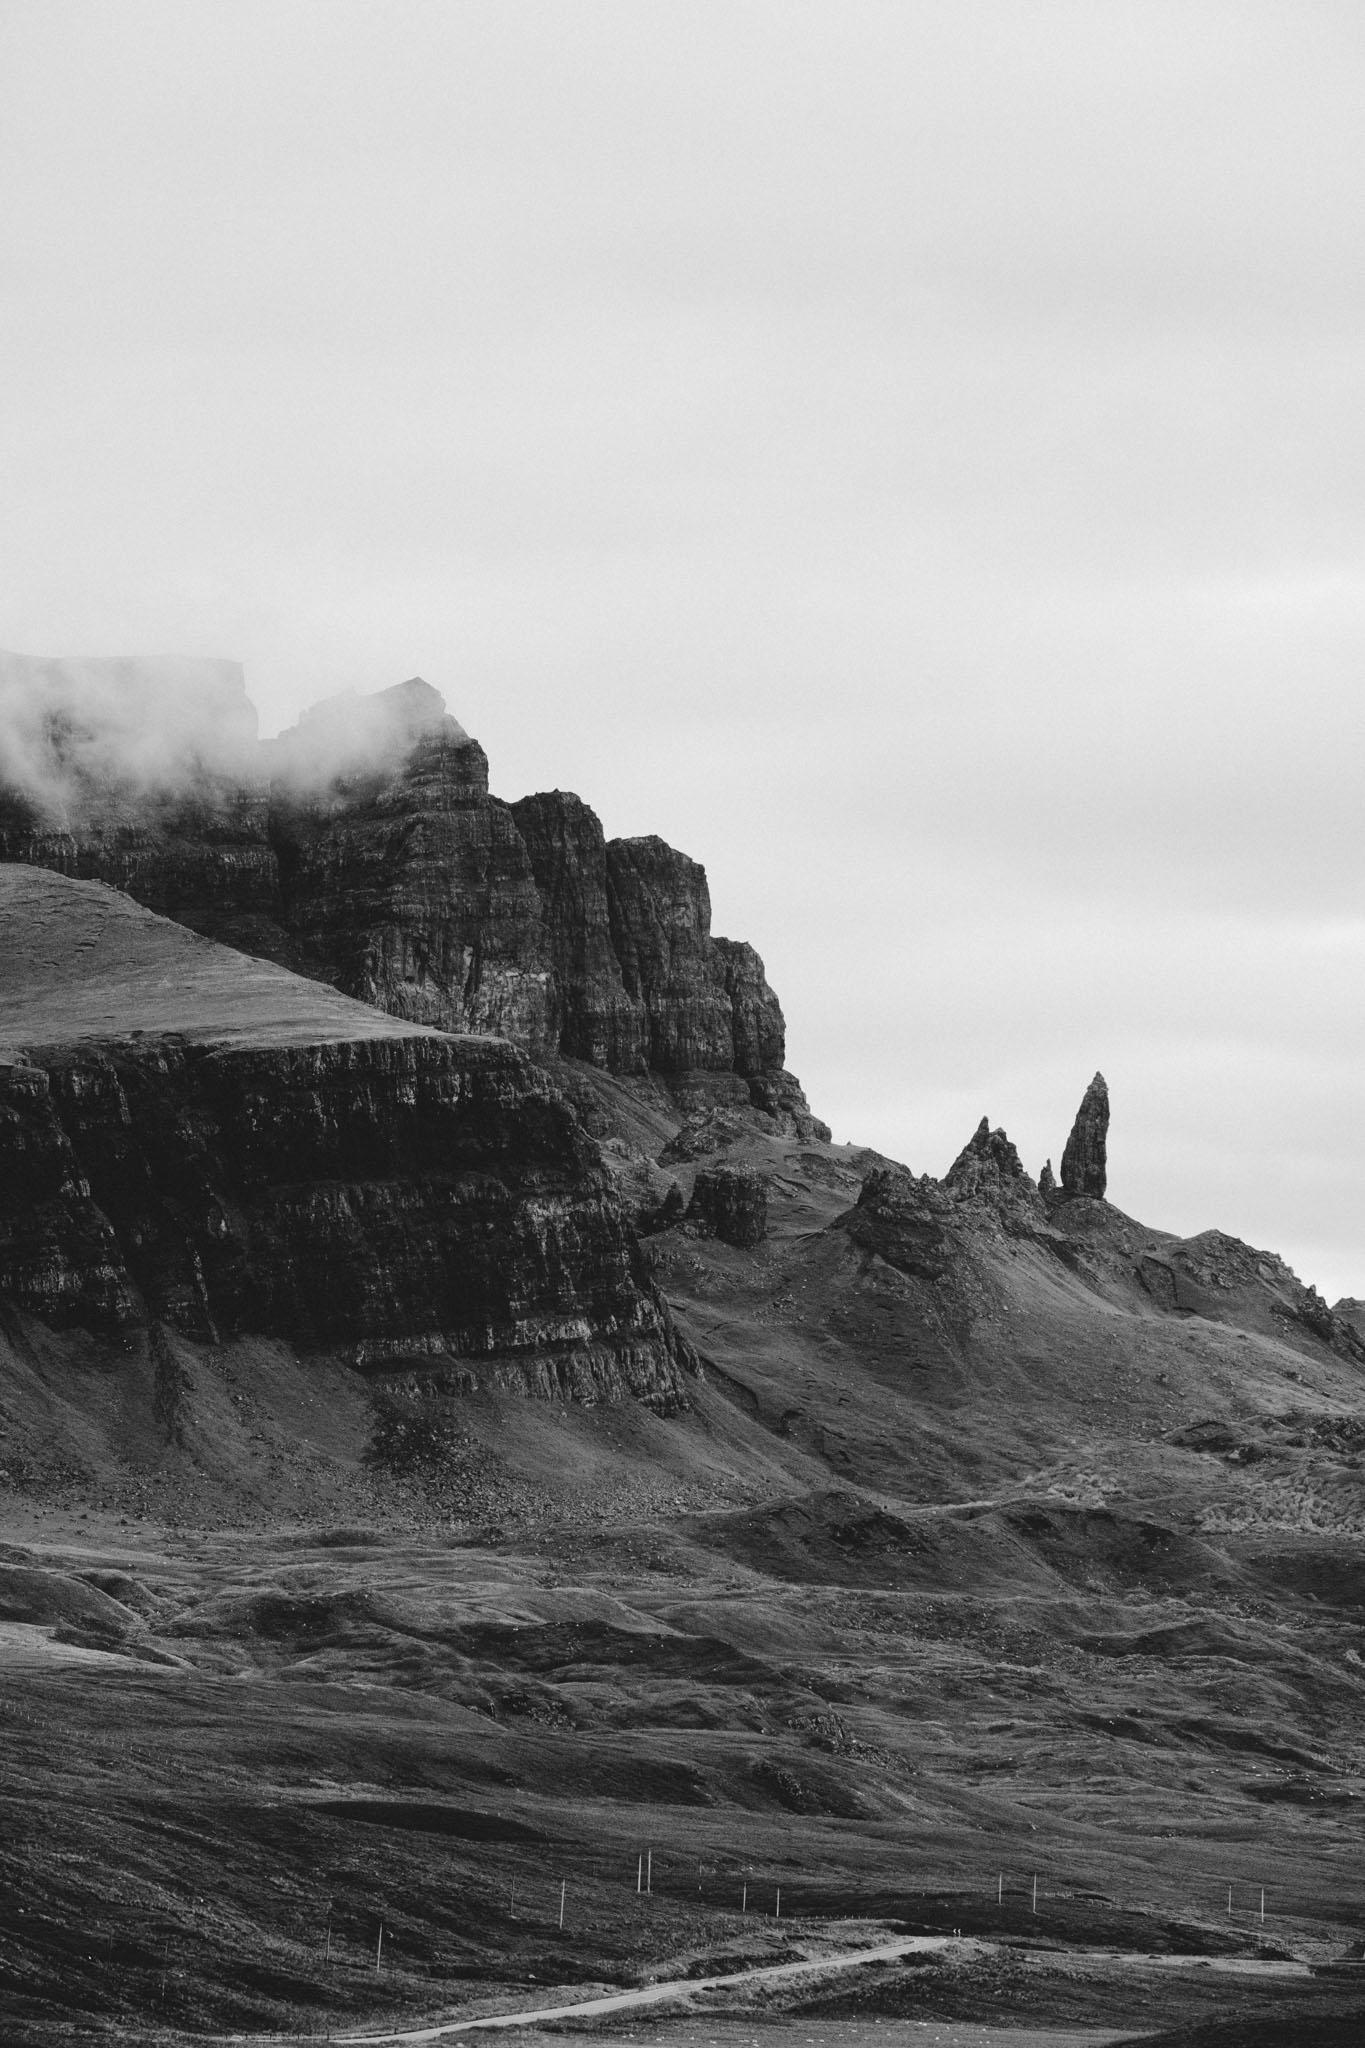 Highland Explorer Tours-160724-090821.jpg